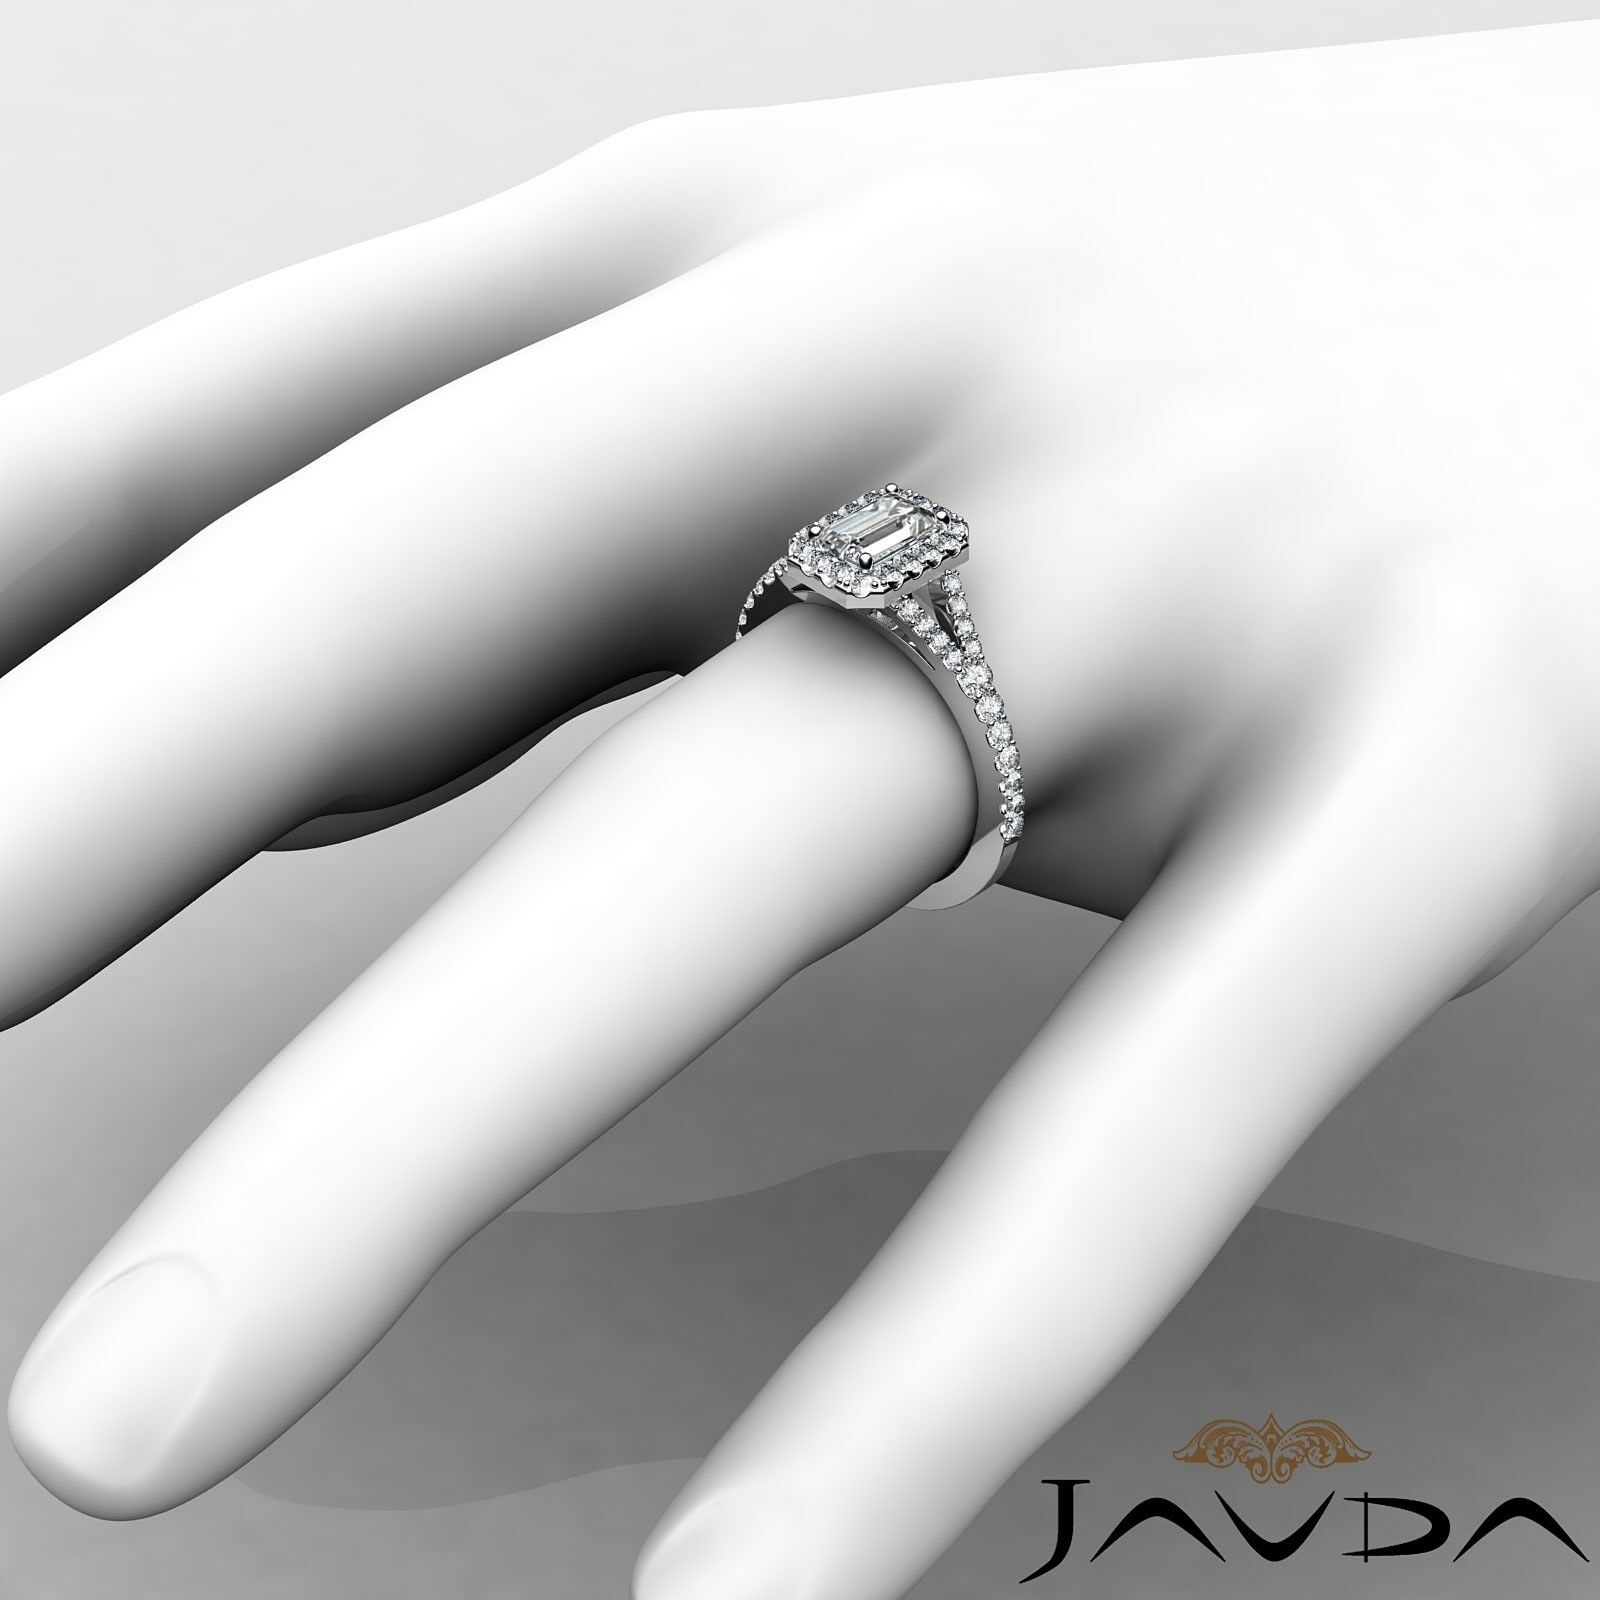 1.23ctw Halo U Pave Stone Emerald Diamond Engagement Ring GIA H-SI1 White Gold 2